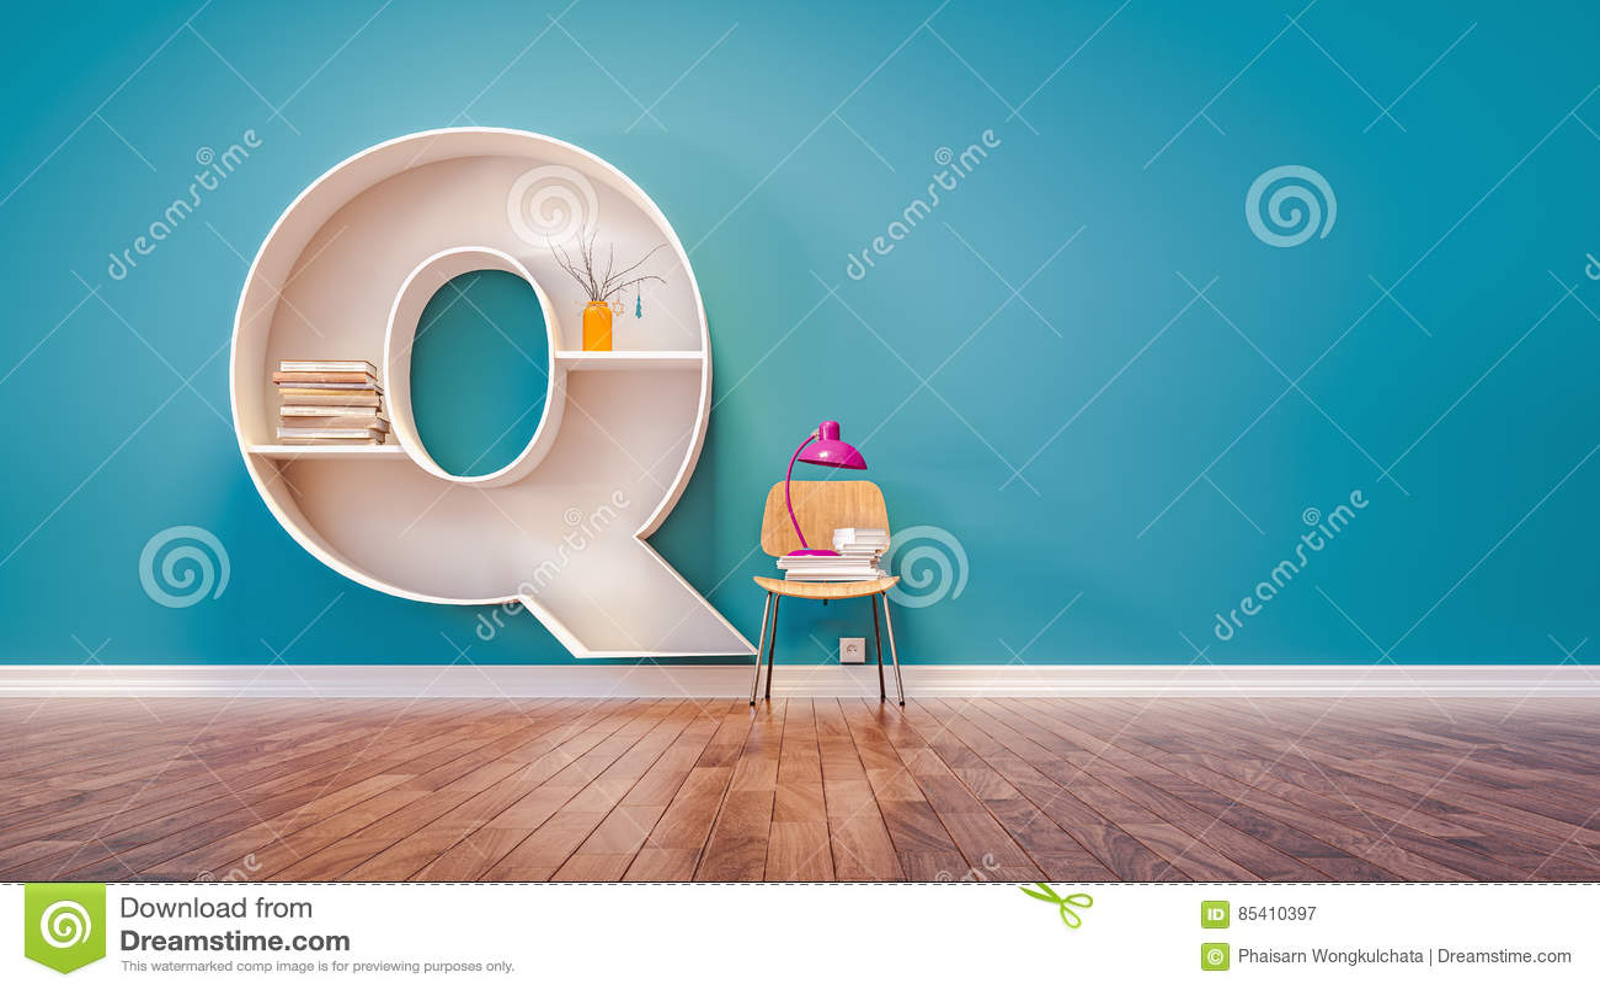 Download Room For Learning The Letter Q Has Designed A Bookshelf Stock Illustration